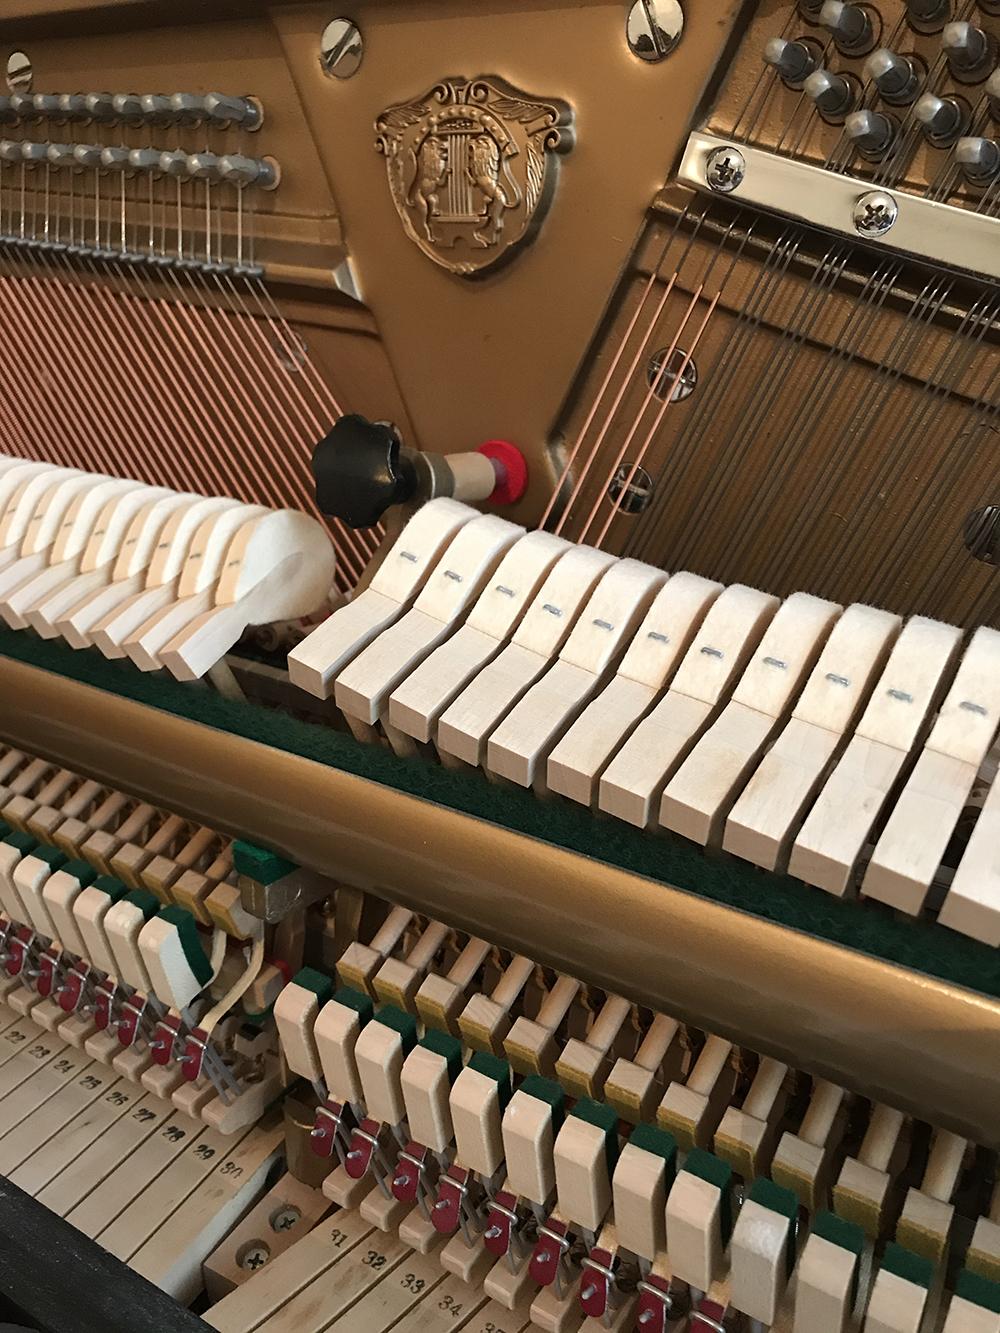 Upright-Piano-Dorset-2.jpg